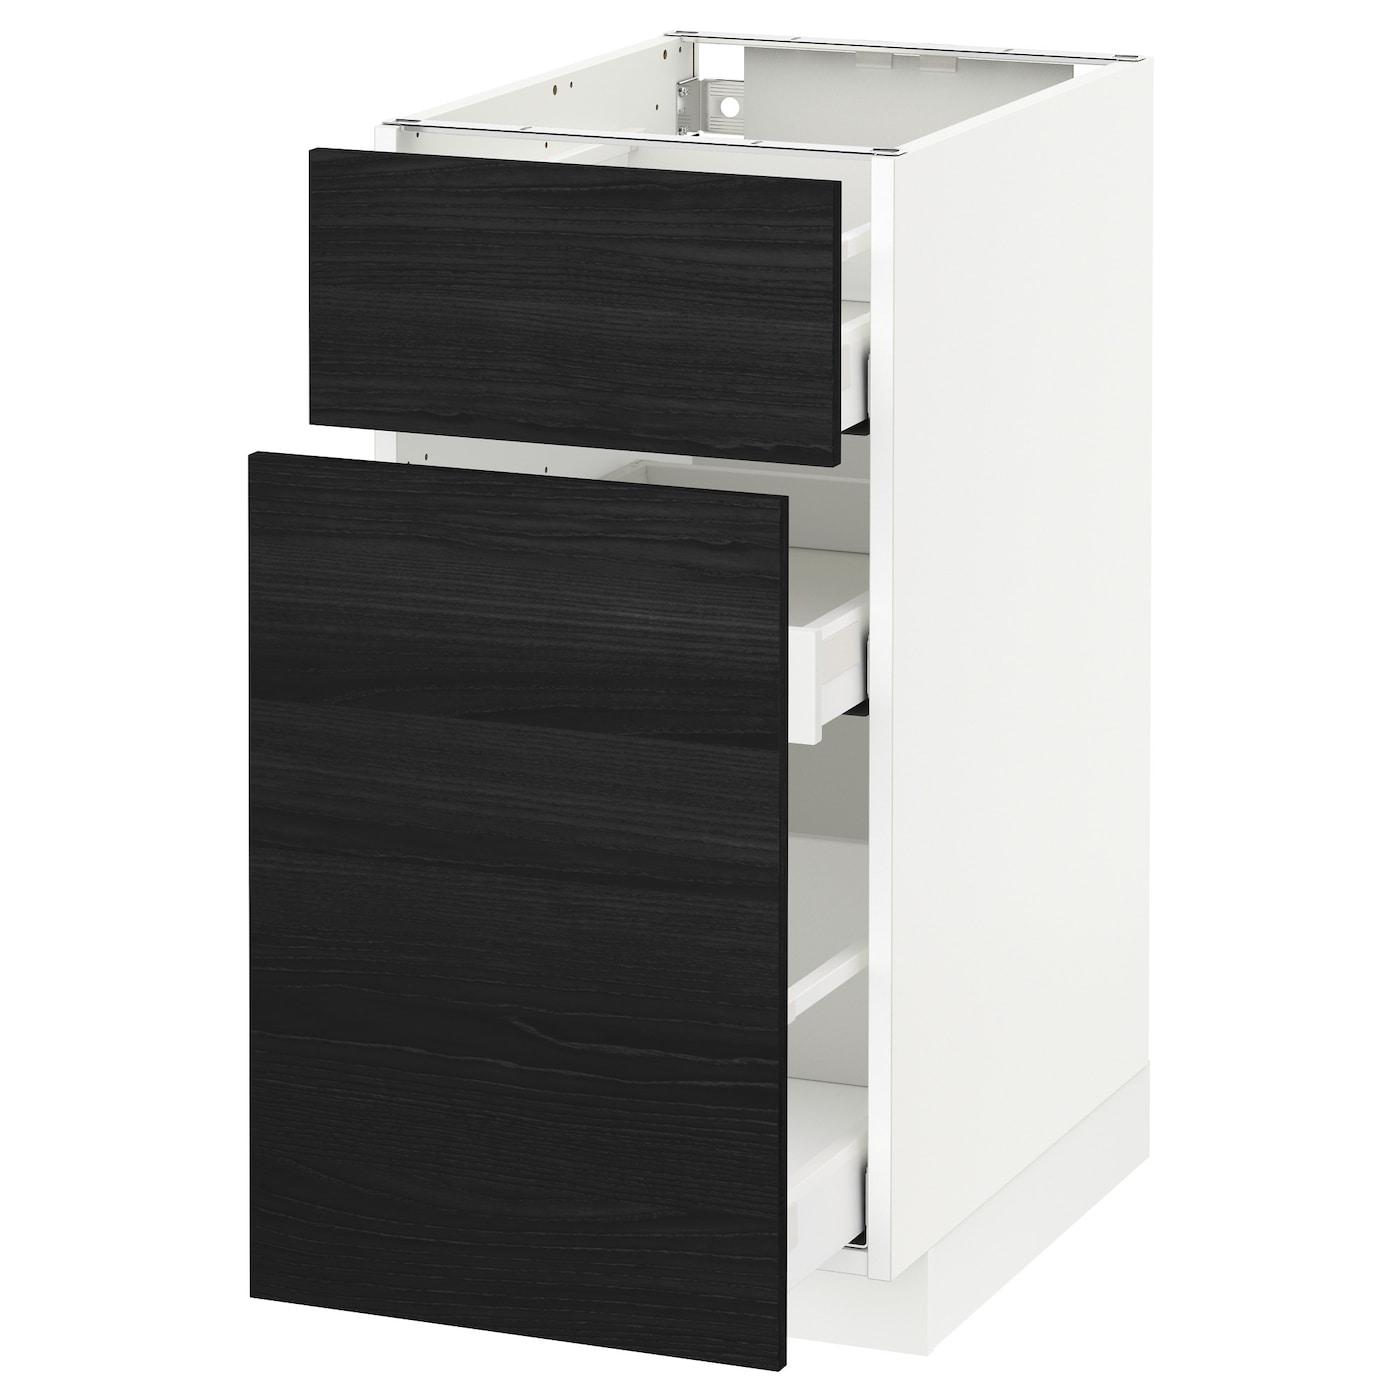 Metod maximera base cabinet p out storage drawer white for Black kitchen base cabinets